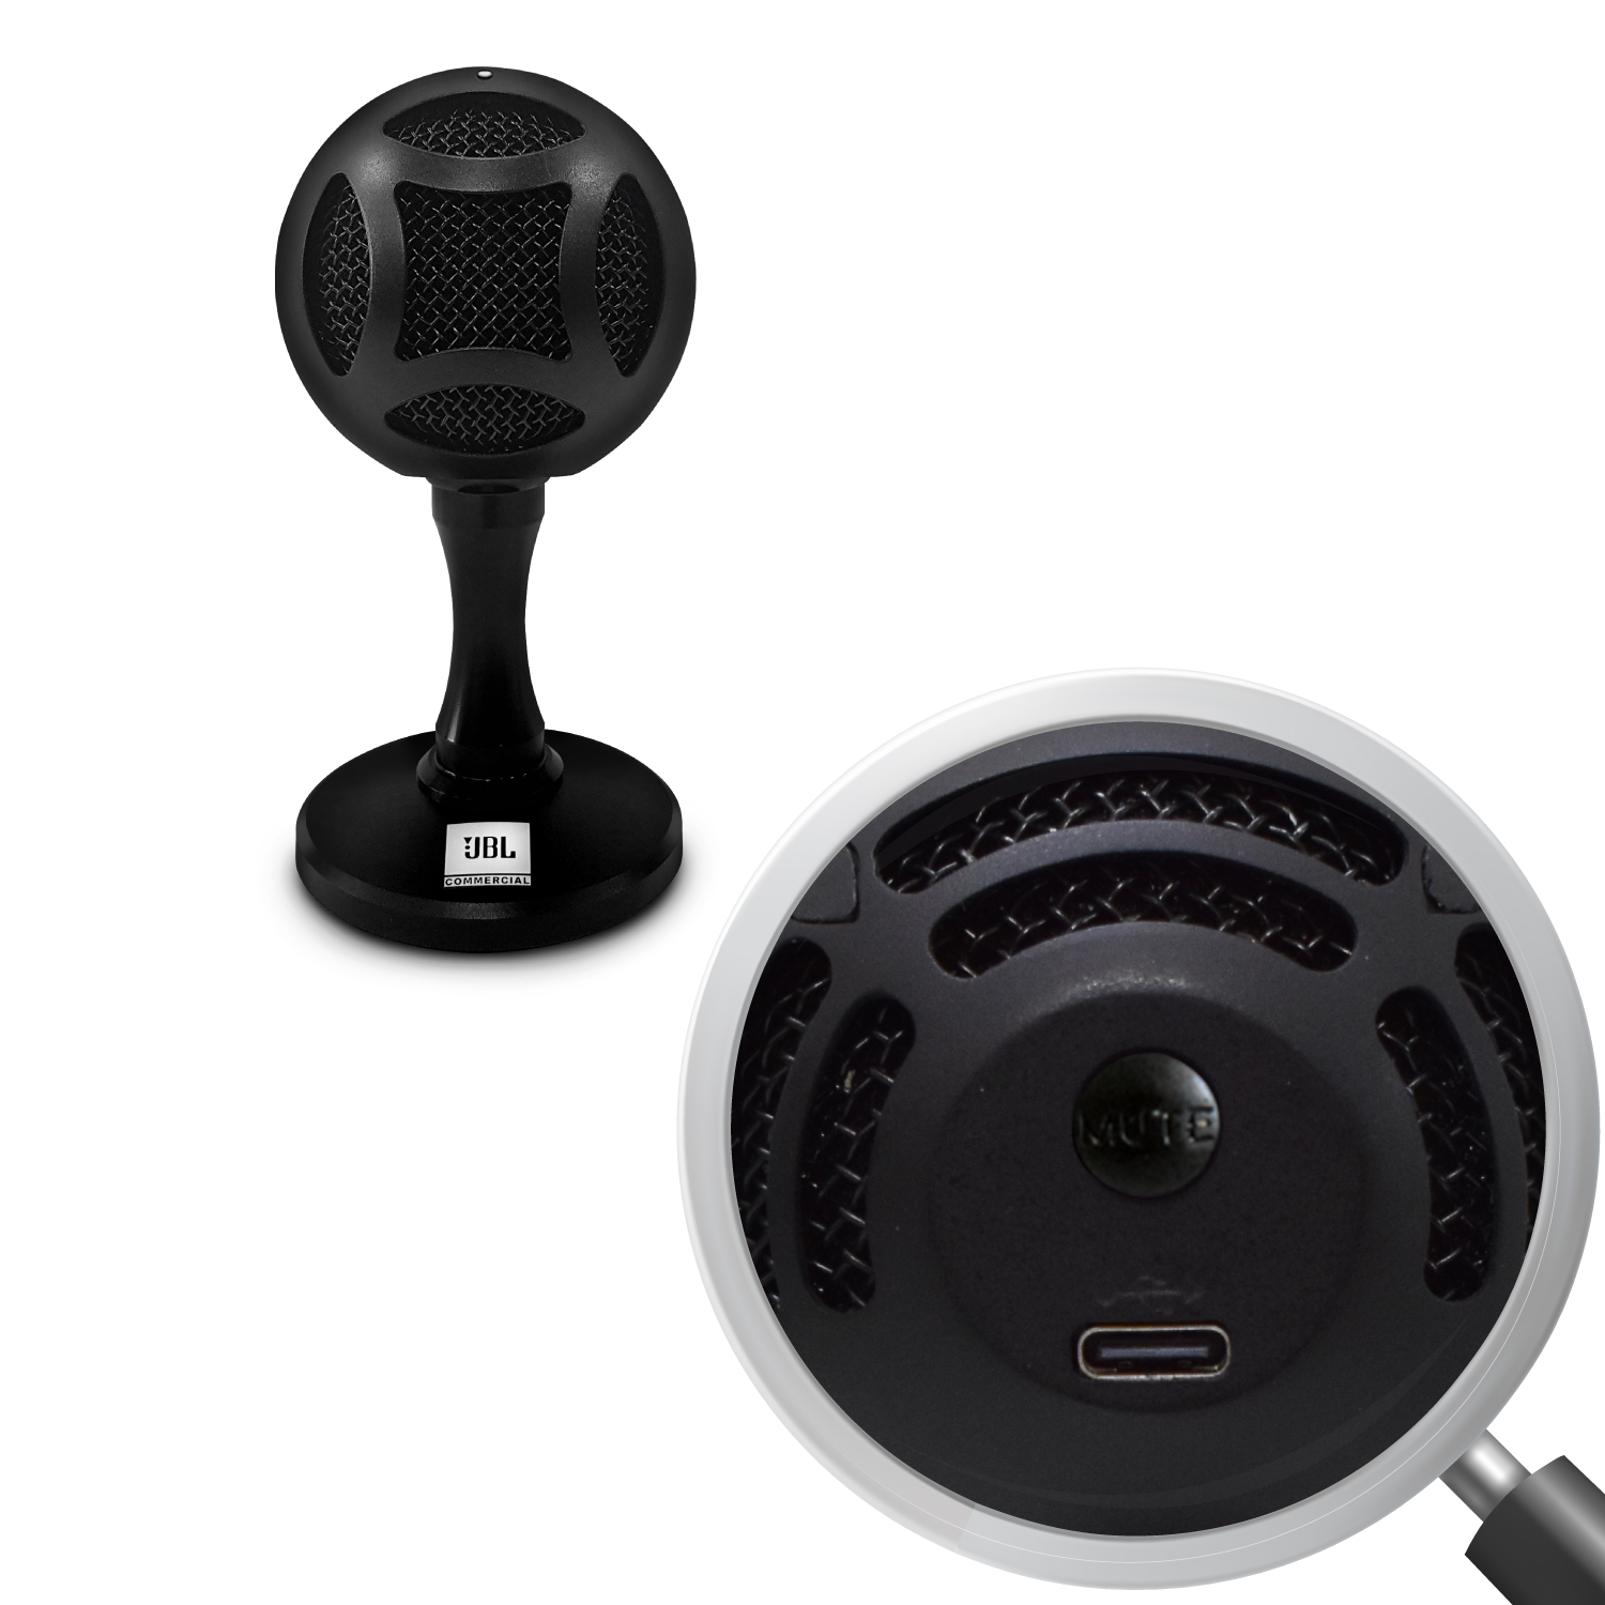 WFH100 - Black - USB powered speakers and Mini USB Microphone Bundle - Detailshot 5